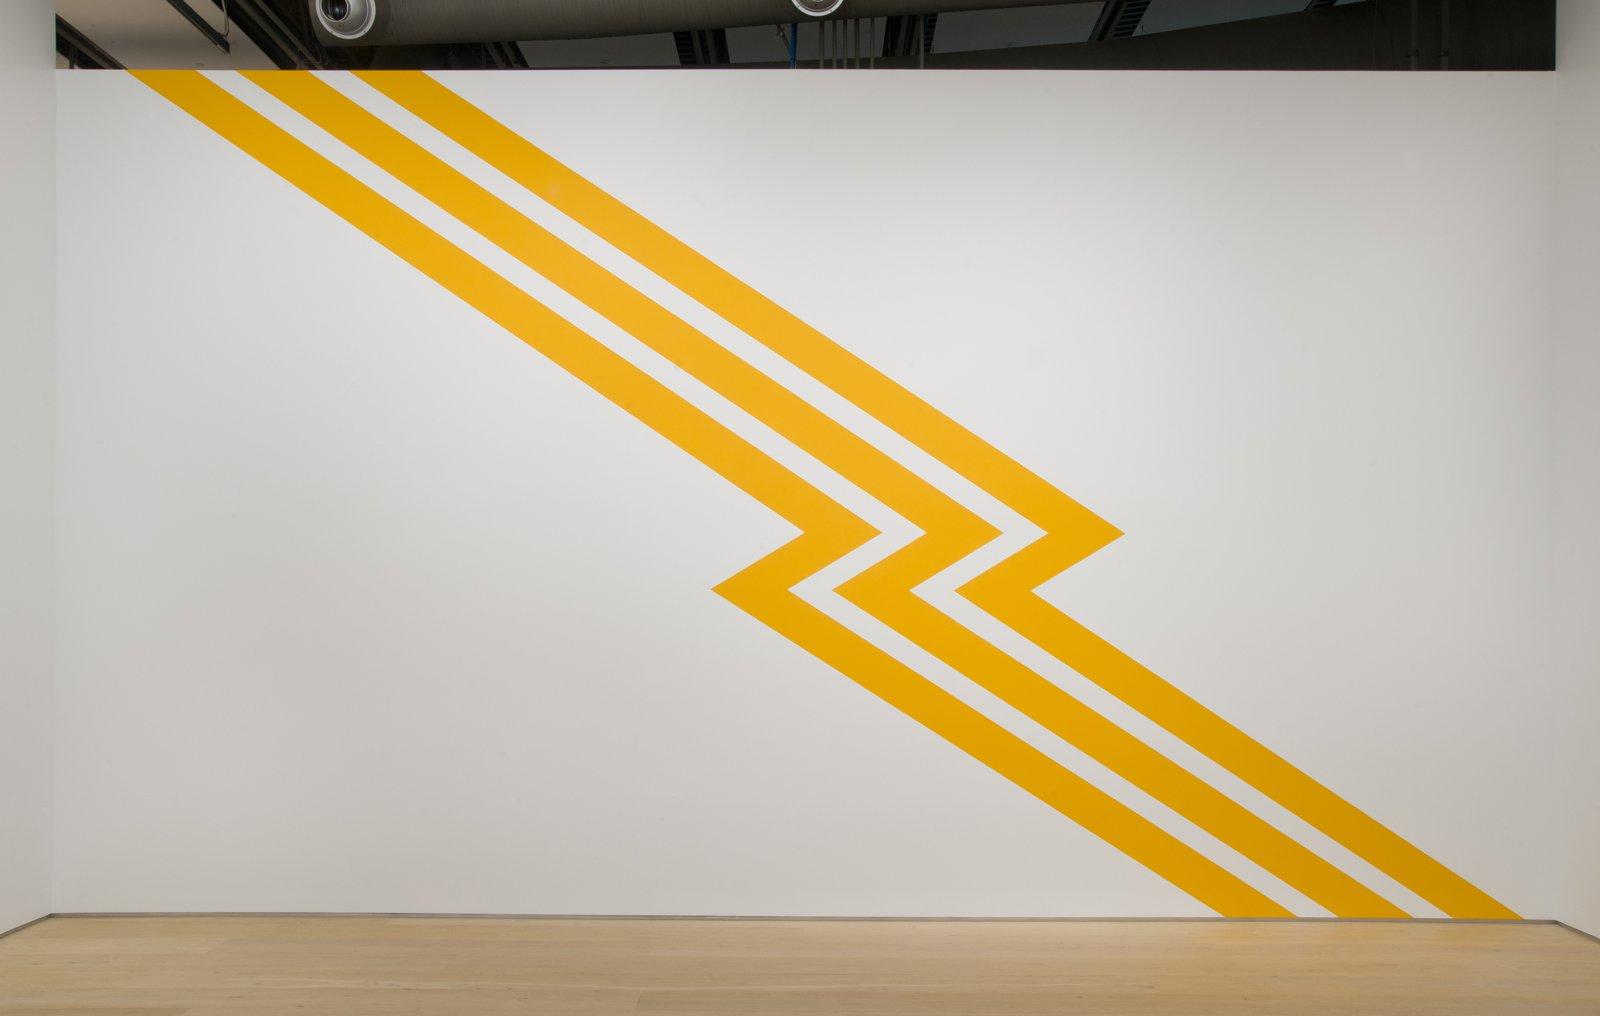 Duane Linklater, installation view,Learning, 2013, Esker Foundation, Calgary, 2014